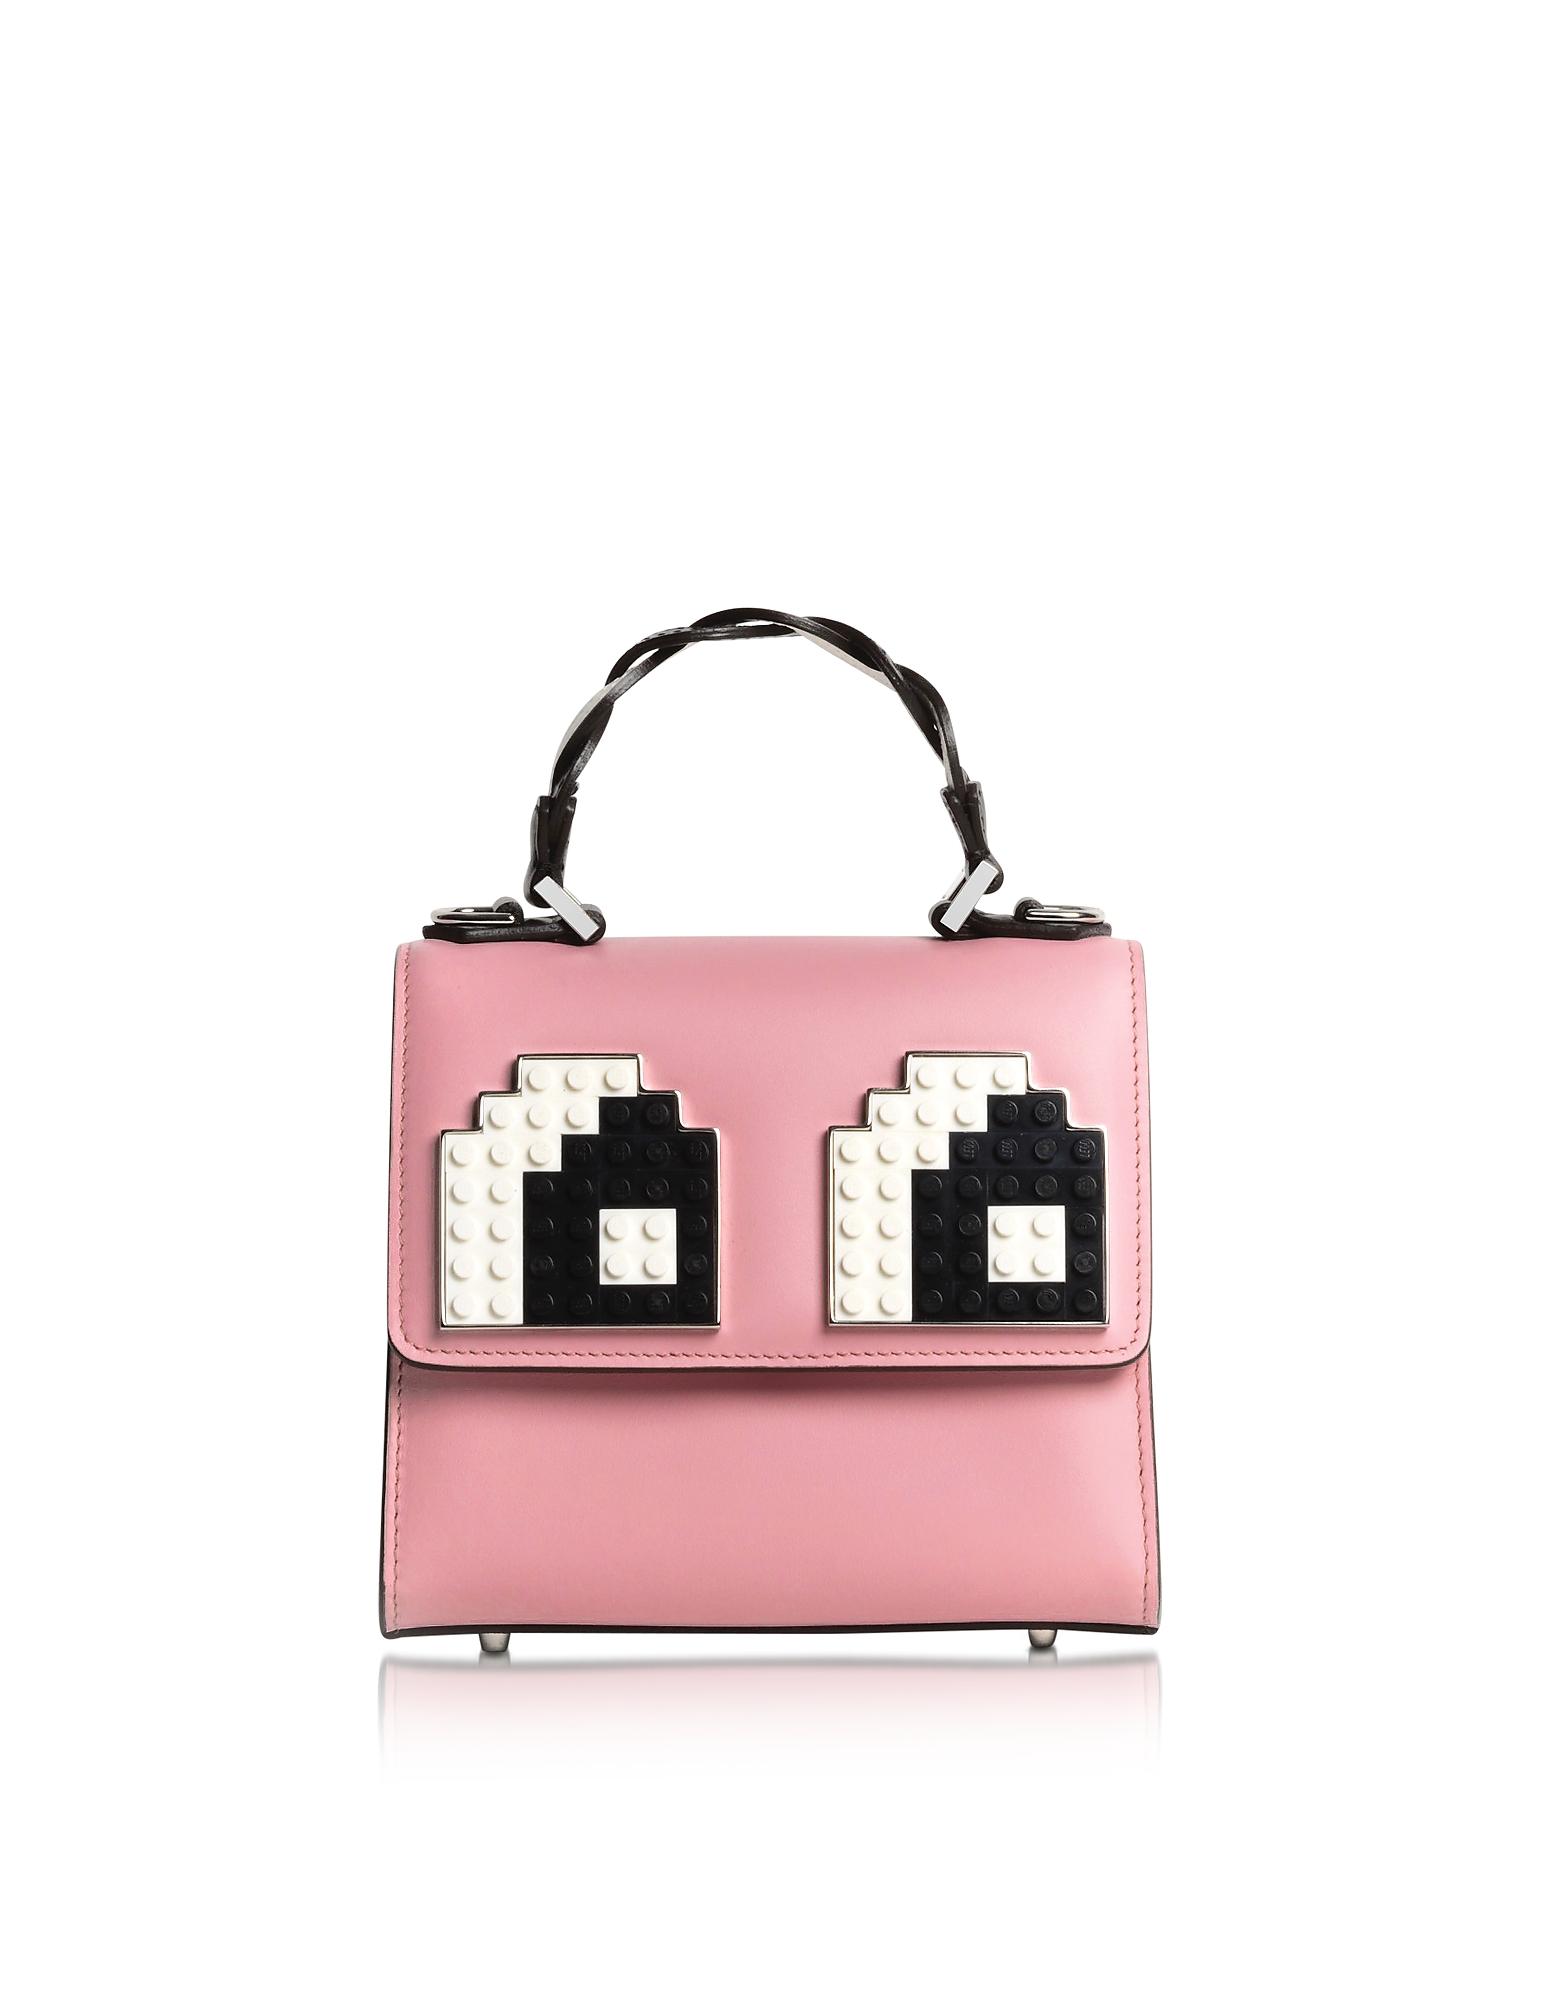 Les Petits Joueurs Handbags, Baby Alex Eyes Braid Leather Satchel Bag